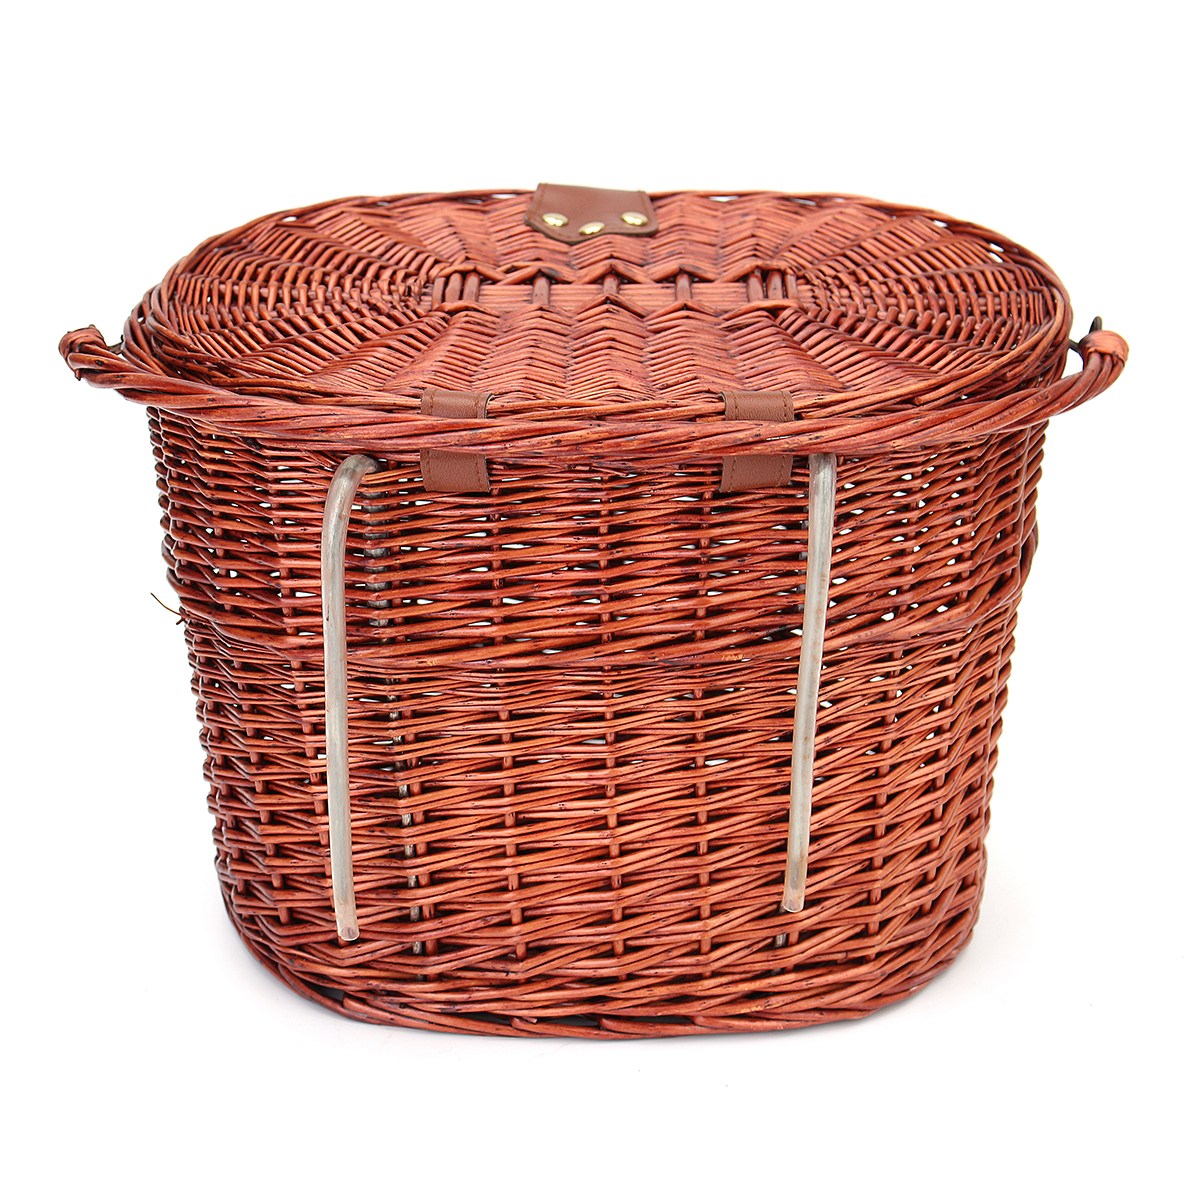 Retro Wicker Bicycle Bike Front Basket Handlebar Cargo Box Shopping Camping